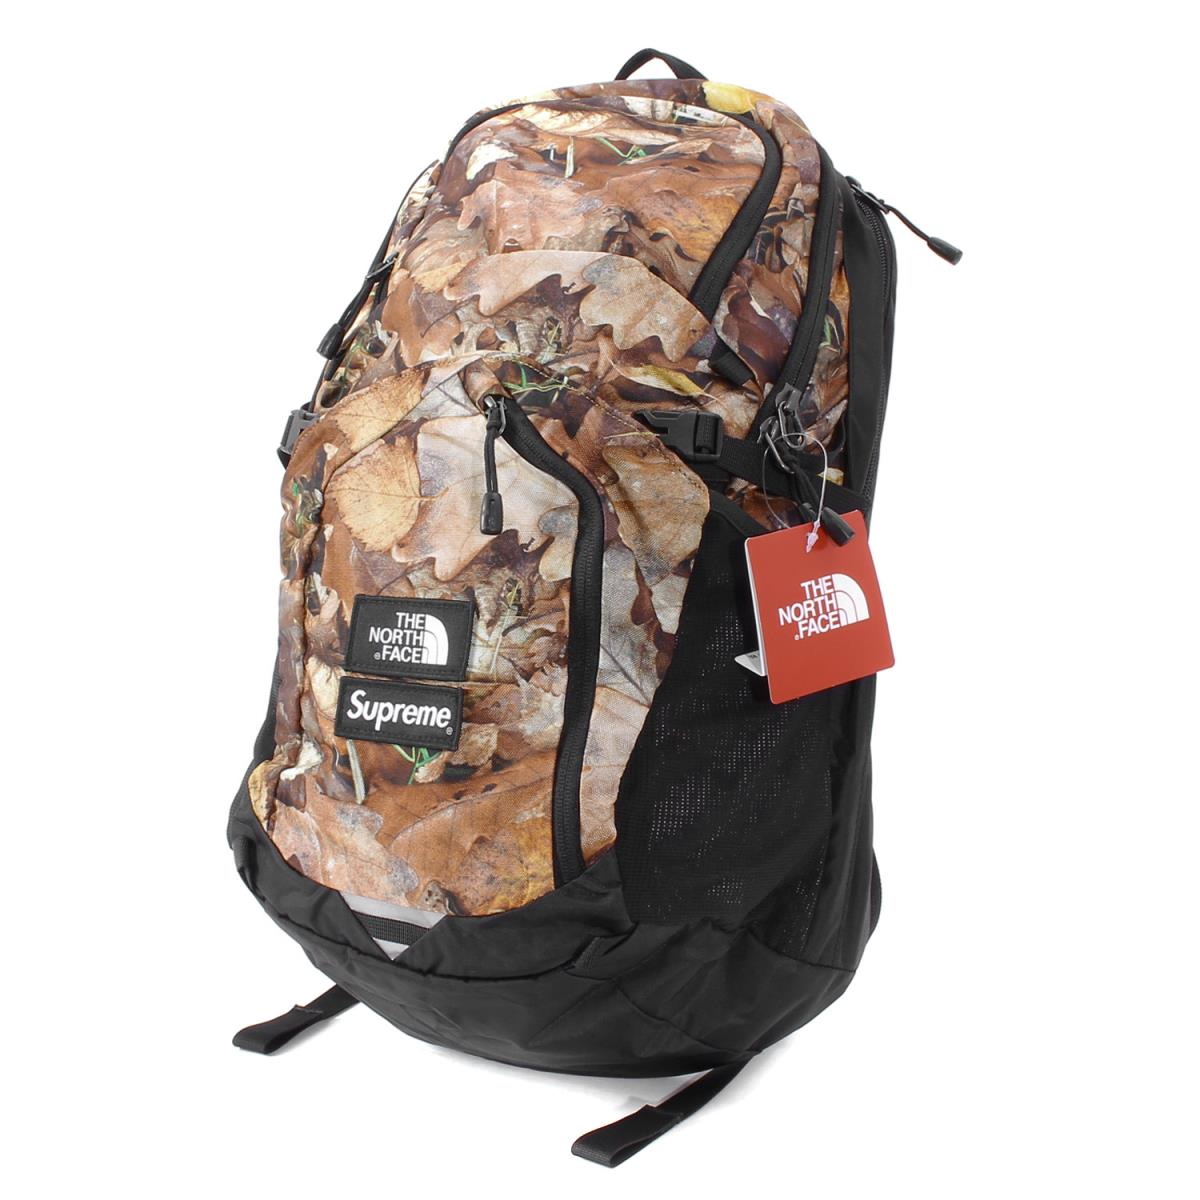 28f1016d5 Supreme (シュプリーム) 16A/W X THE NORTH FACE leaf duck backpack (Leaves Pocono  Backpack) leaf hunting duck